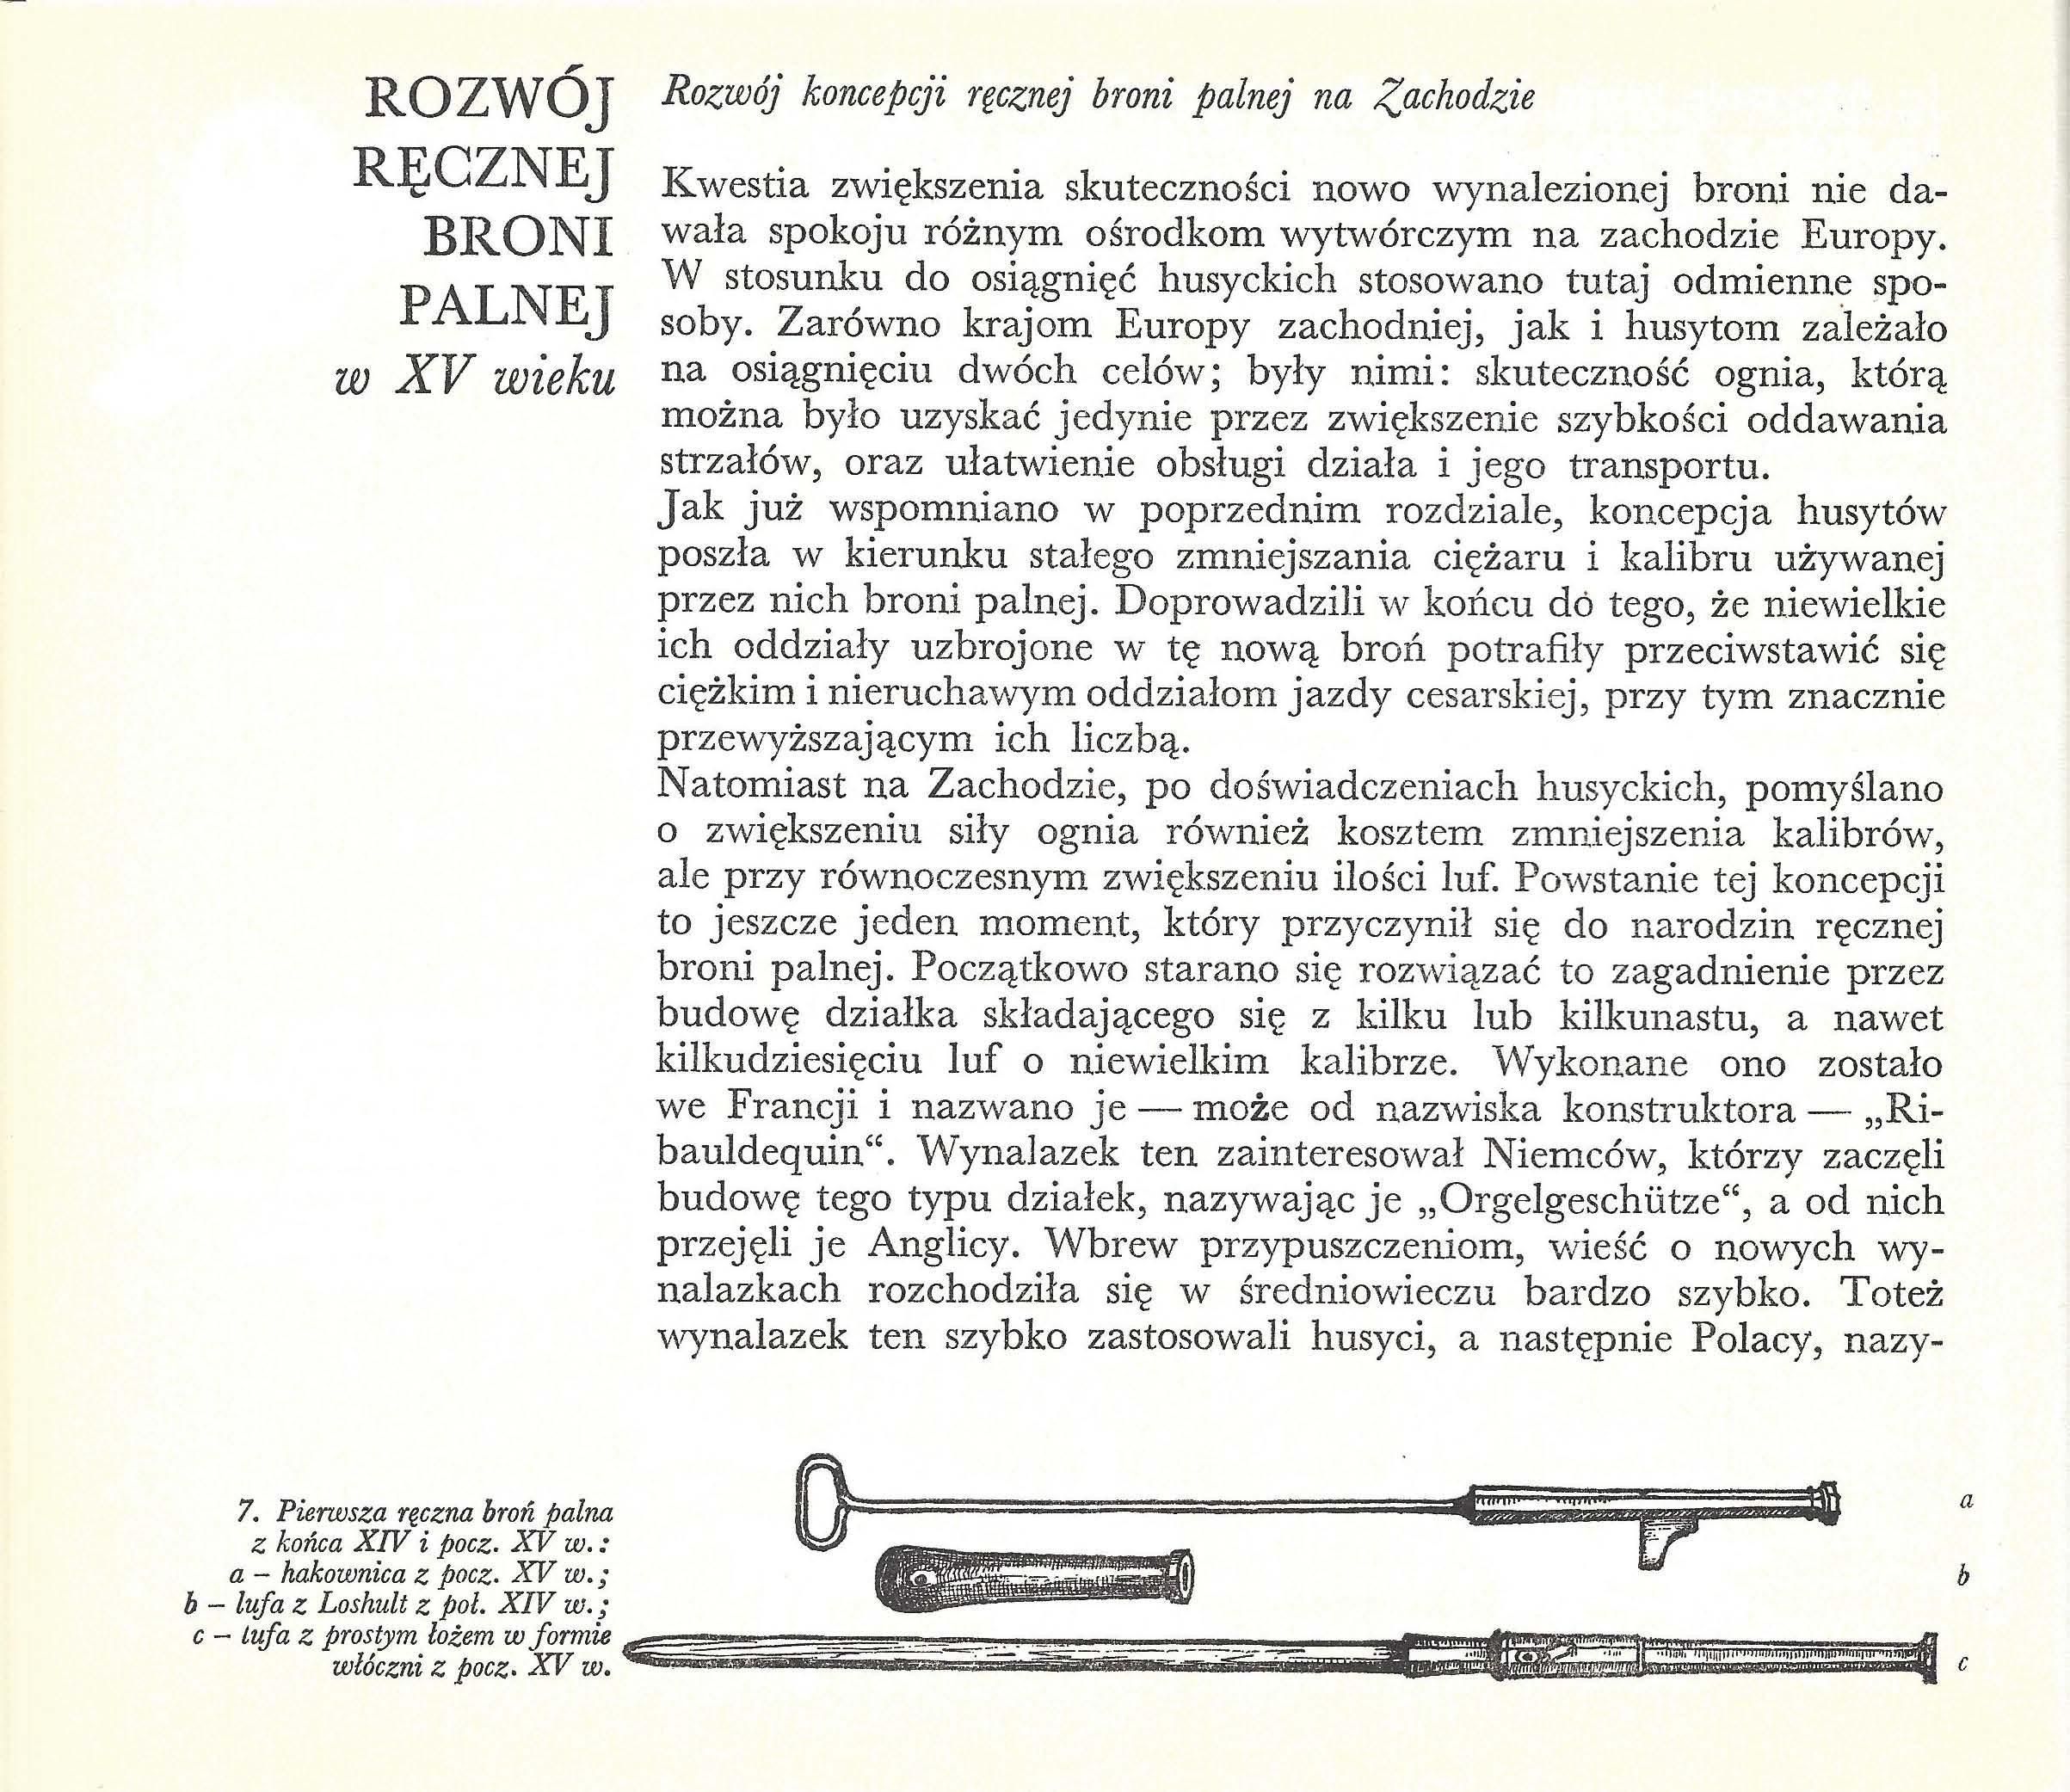 Strony od polska.bron.palna.kobielski24-31_Strona_1